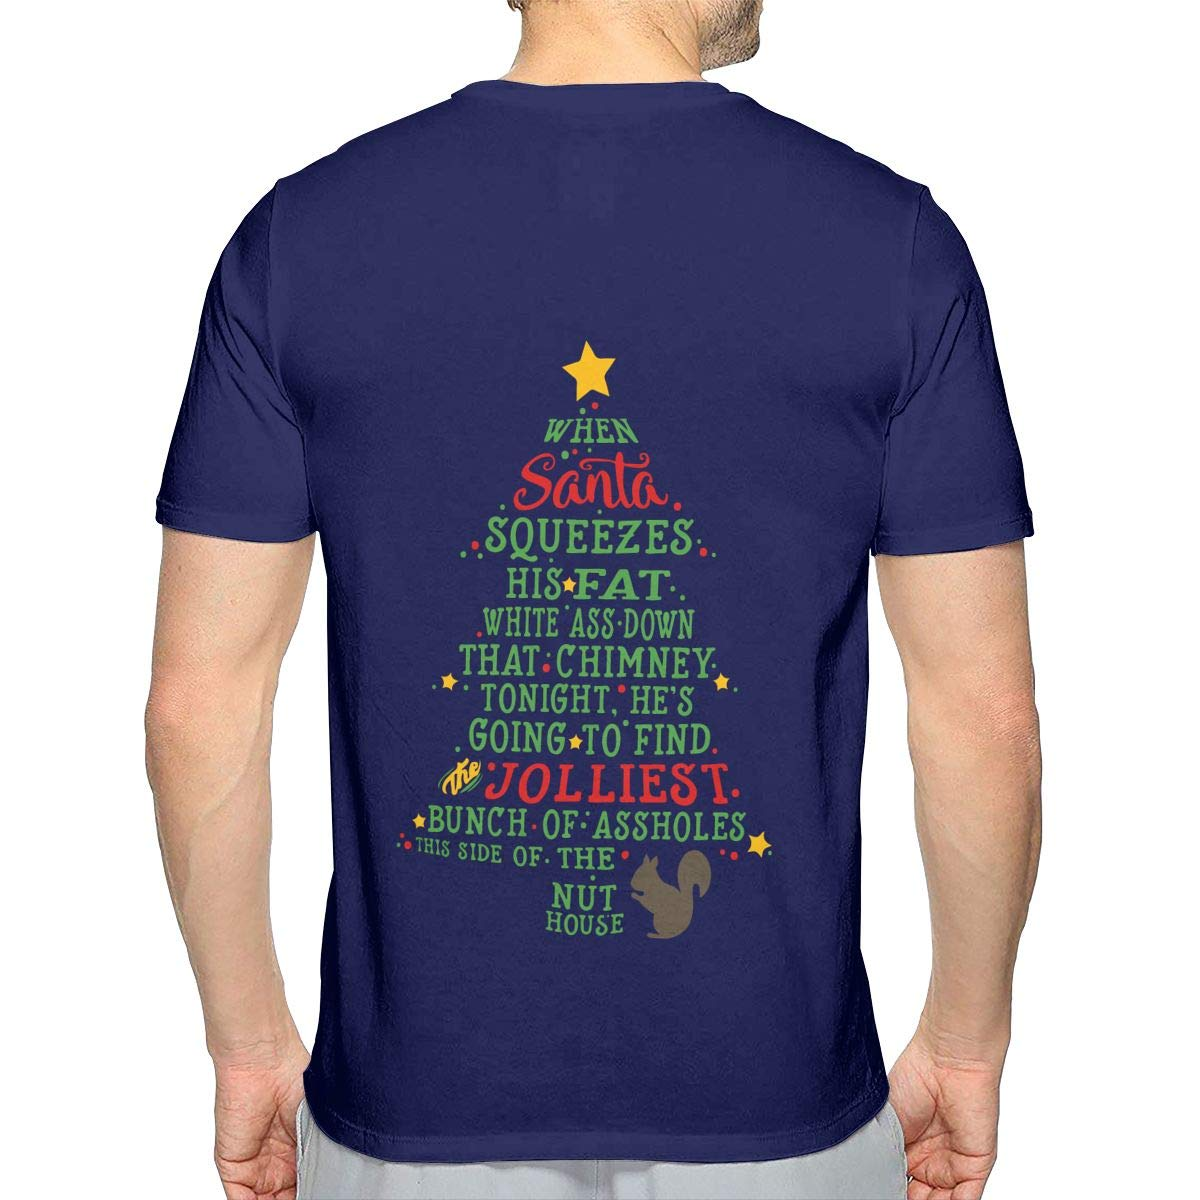 JJKKFG-H Jolliest Bunch of A-Holes Mens Sports Short Sleeve Tshirts